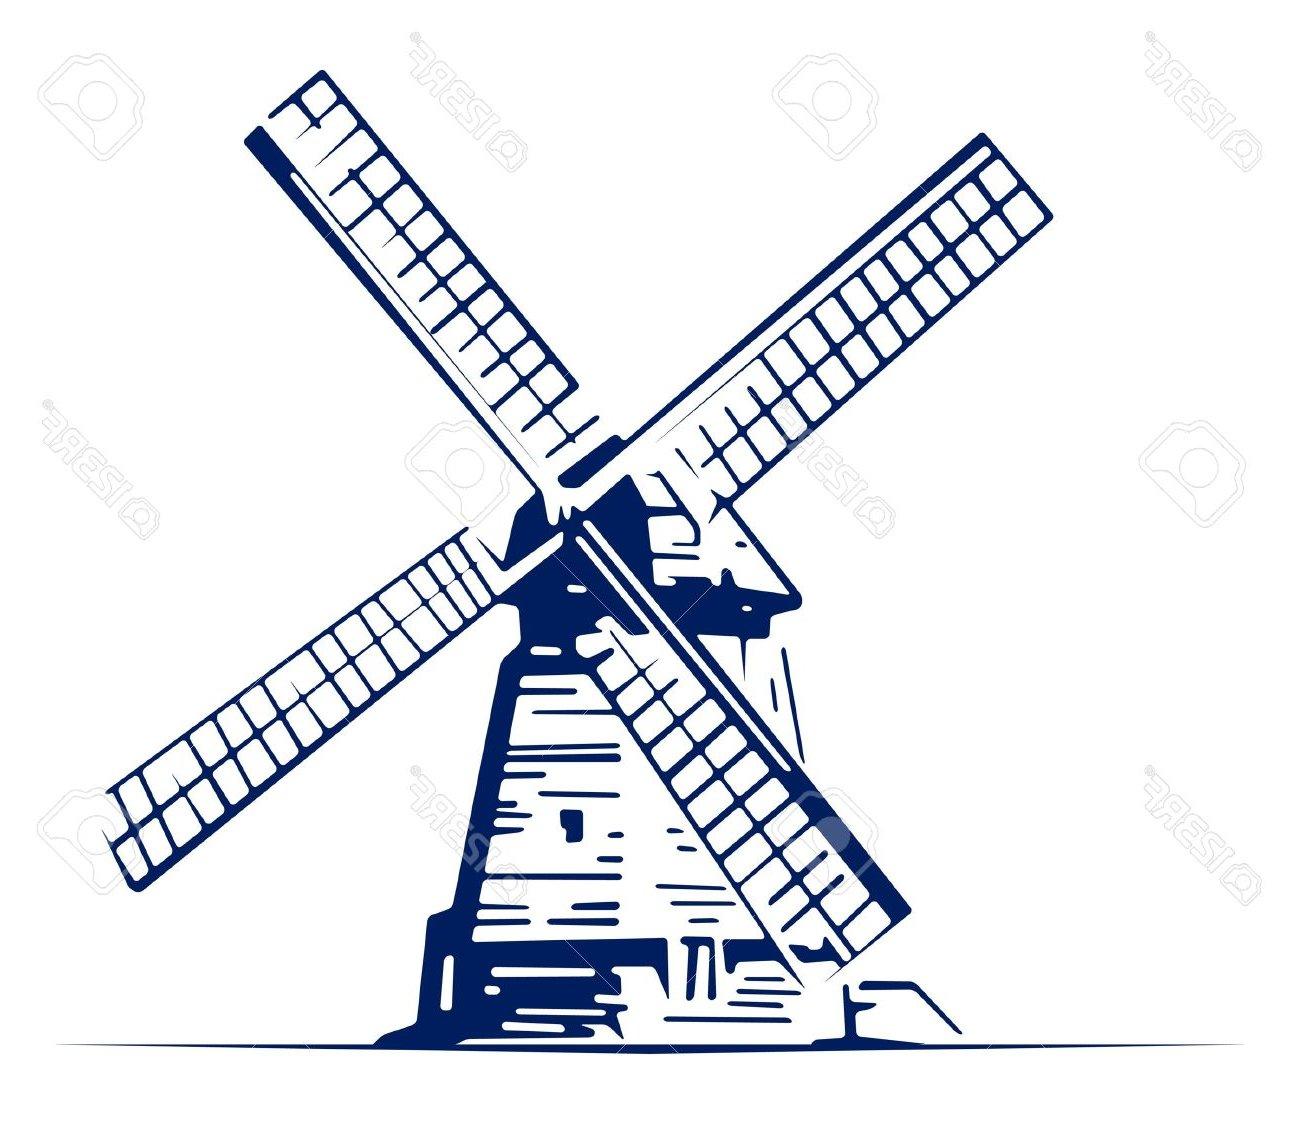 Windmill Clipart at GetDrawings.com.